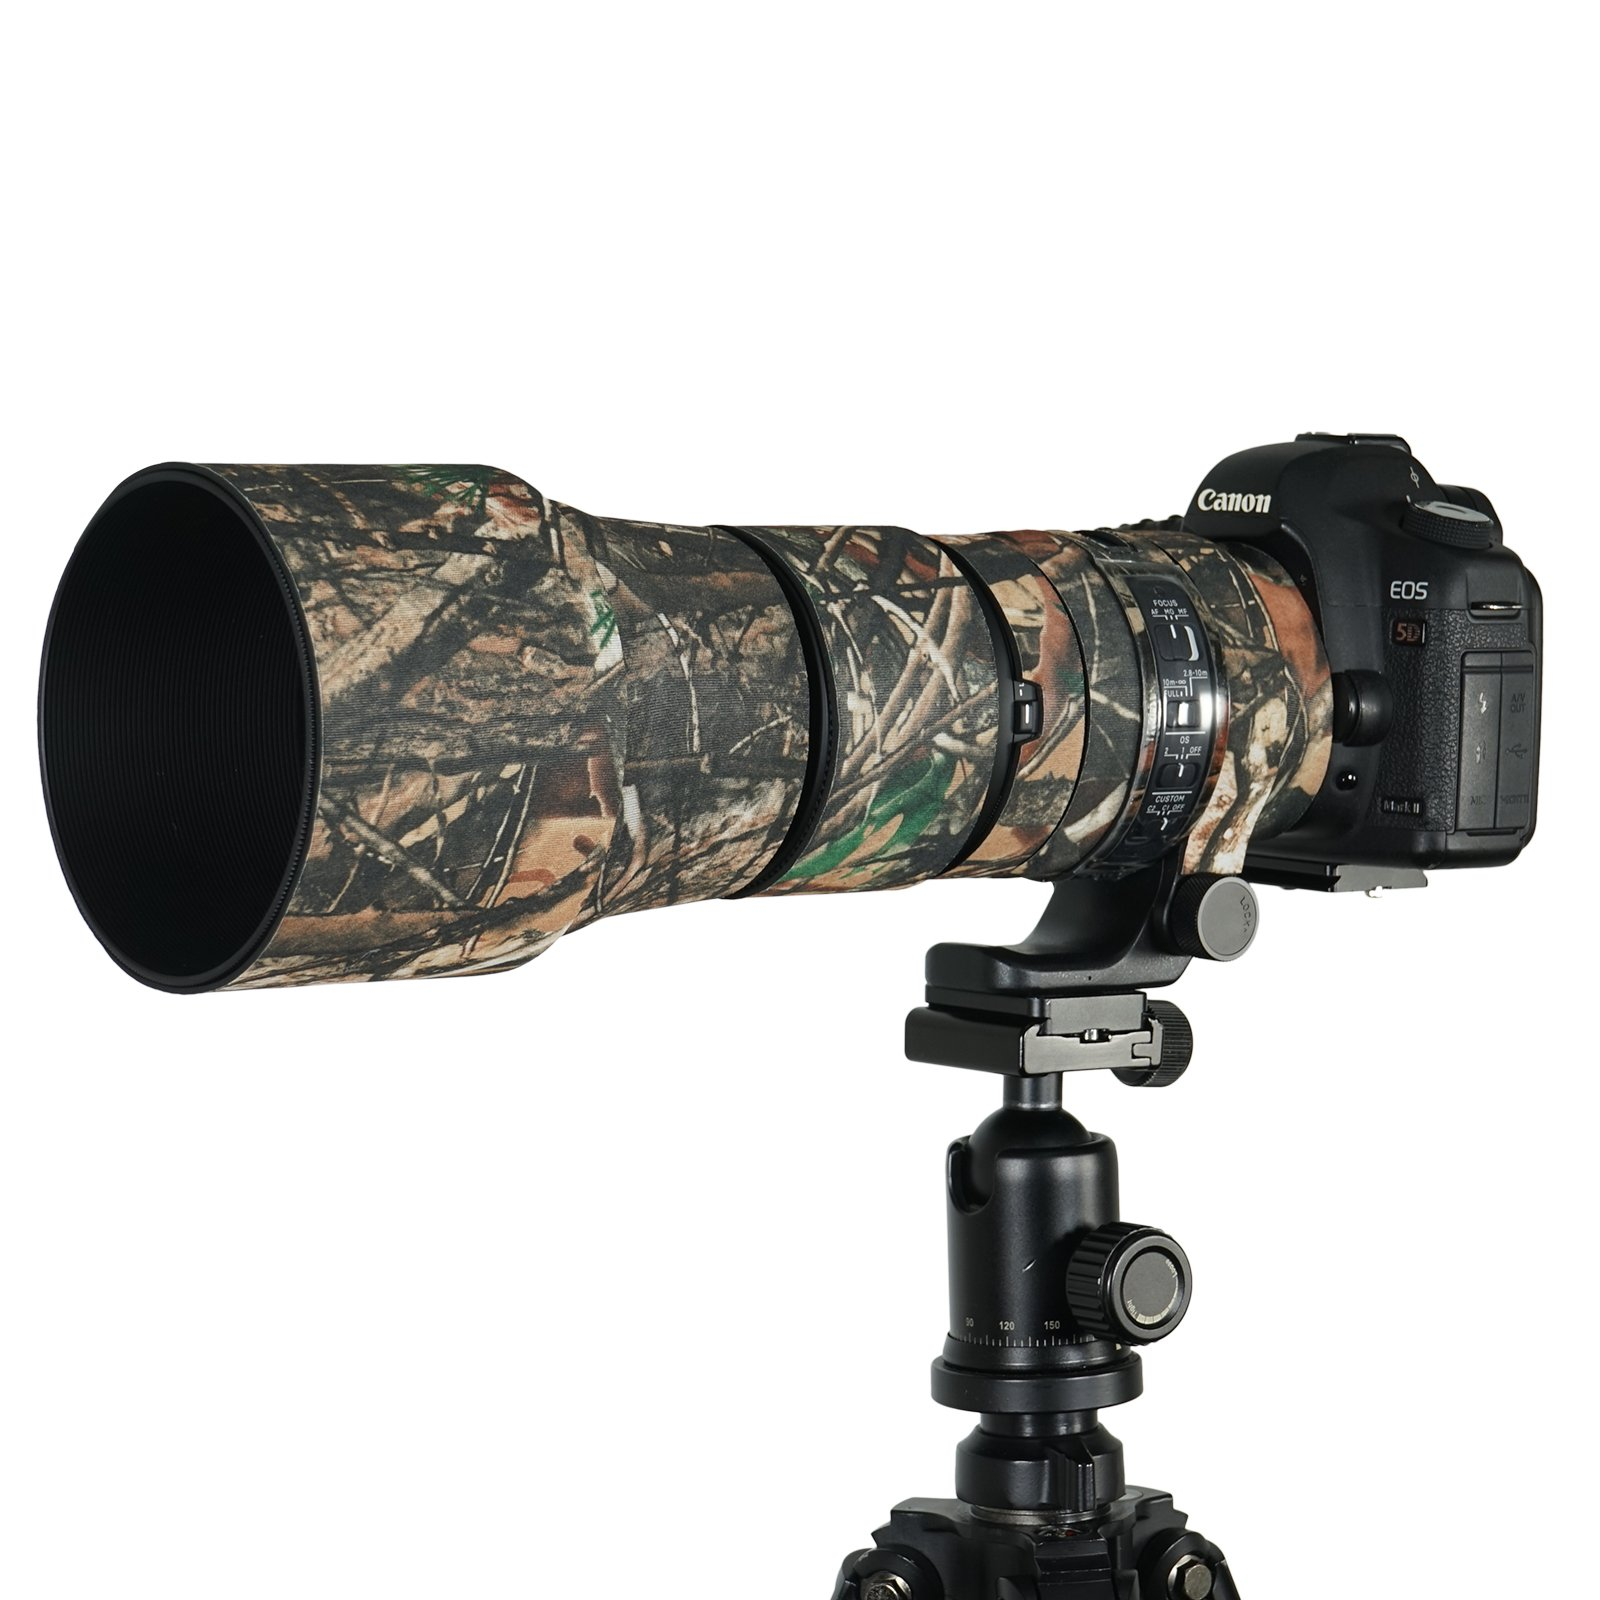 Mekingstudio Camera Lens Cover Protective for Sigma 150-600mm C - Forest Green Camo by Mekingstudio